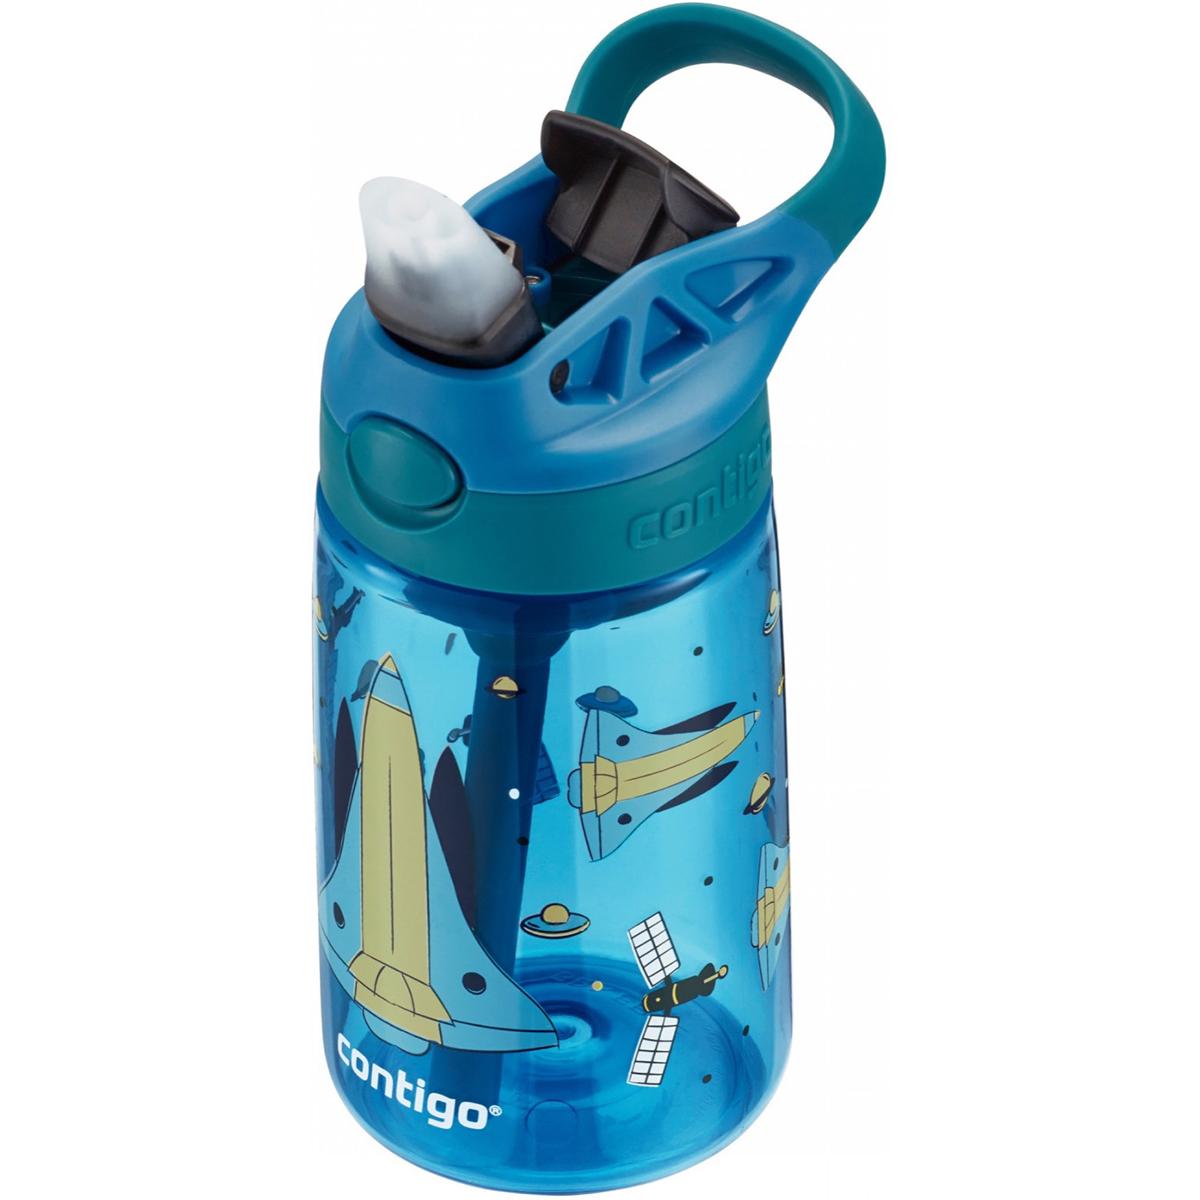 Contigo-Kid-039-s-14-oz-AutoSpout-Straw-Water-Bottle-with-Easy-Clean-Lid thumbnail 40